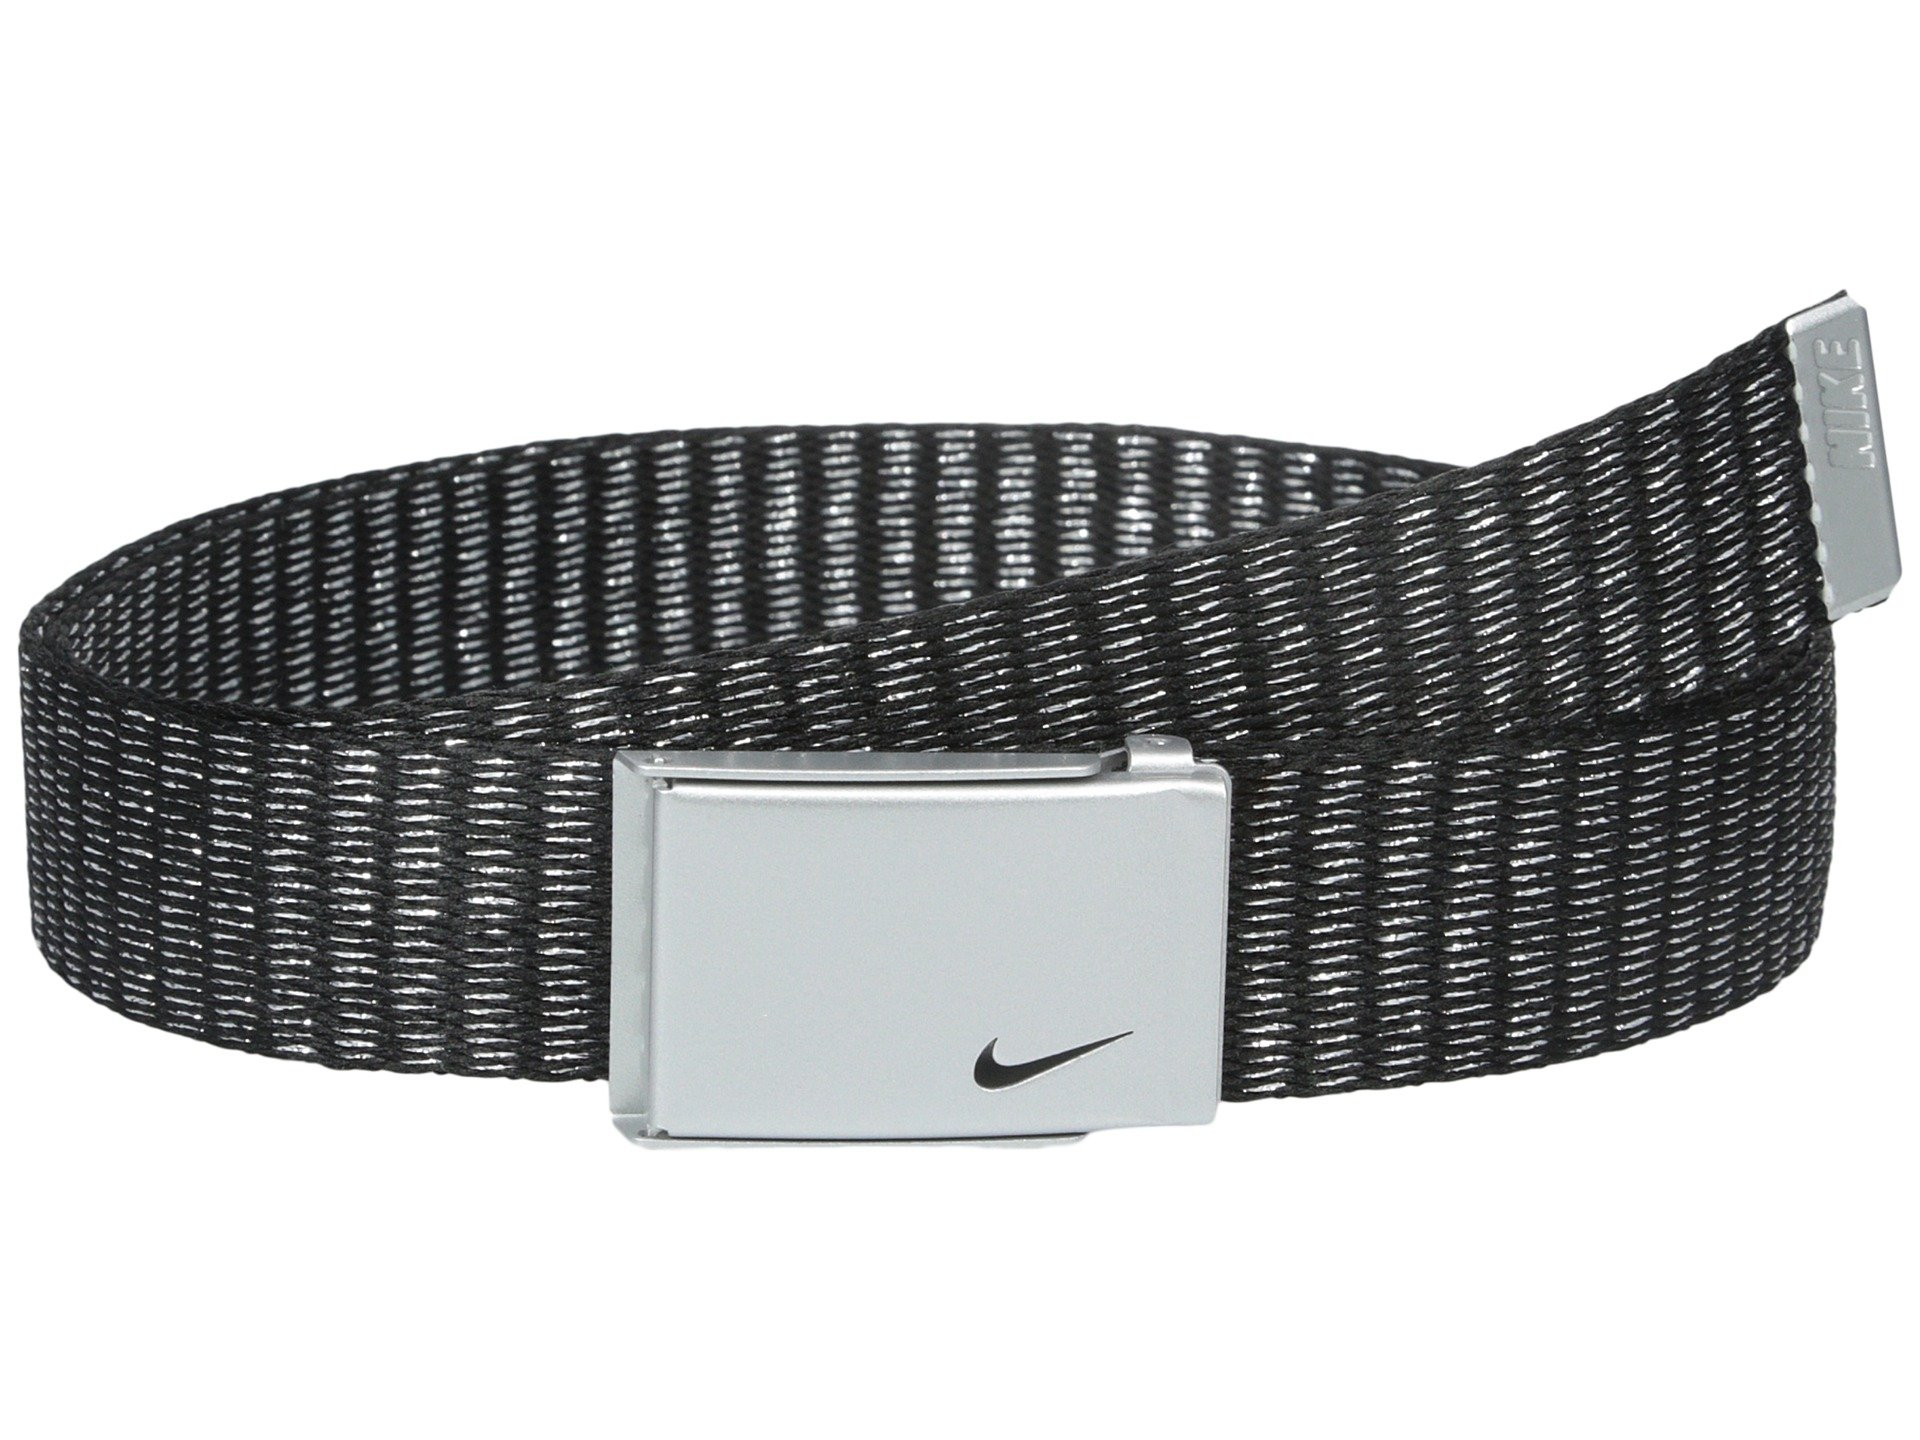 Correa o Cinturon para Mujer Nike Lurex Single Web  + Nike en VeoyCompro.net